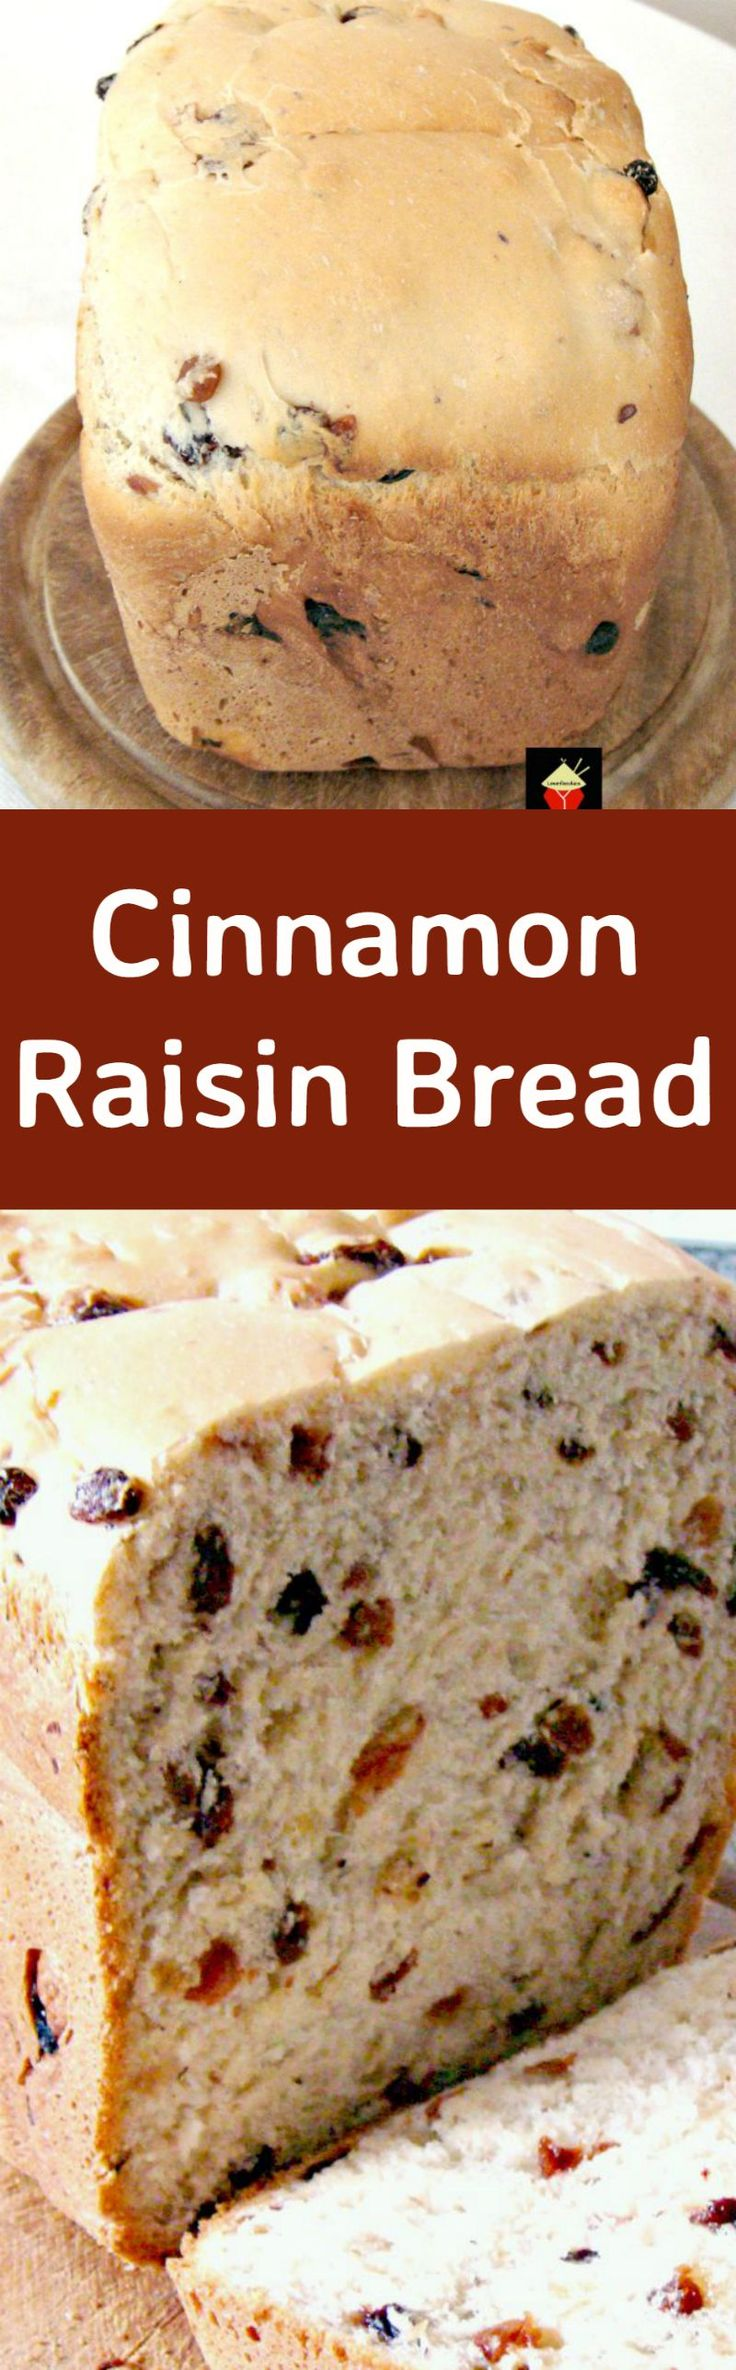 Cinnamon Raisin Bread A Nice Easy Bread To Make, Using Your Bread Maker Or